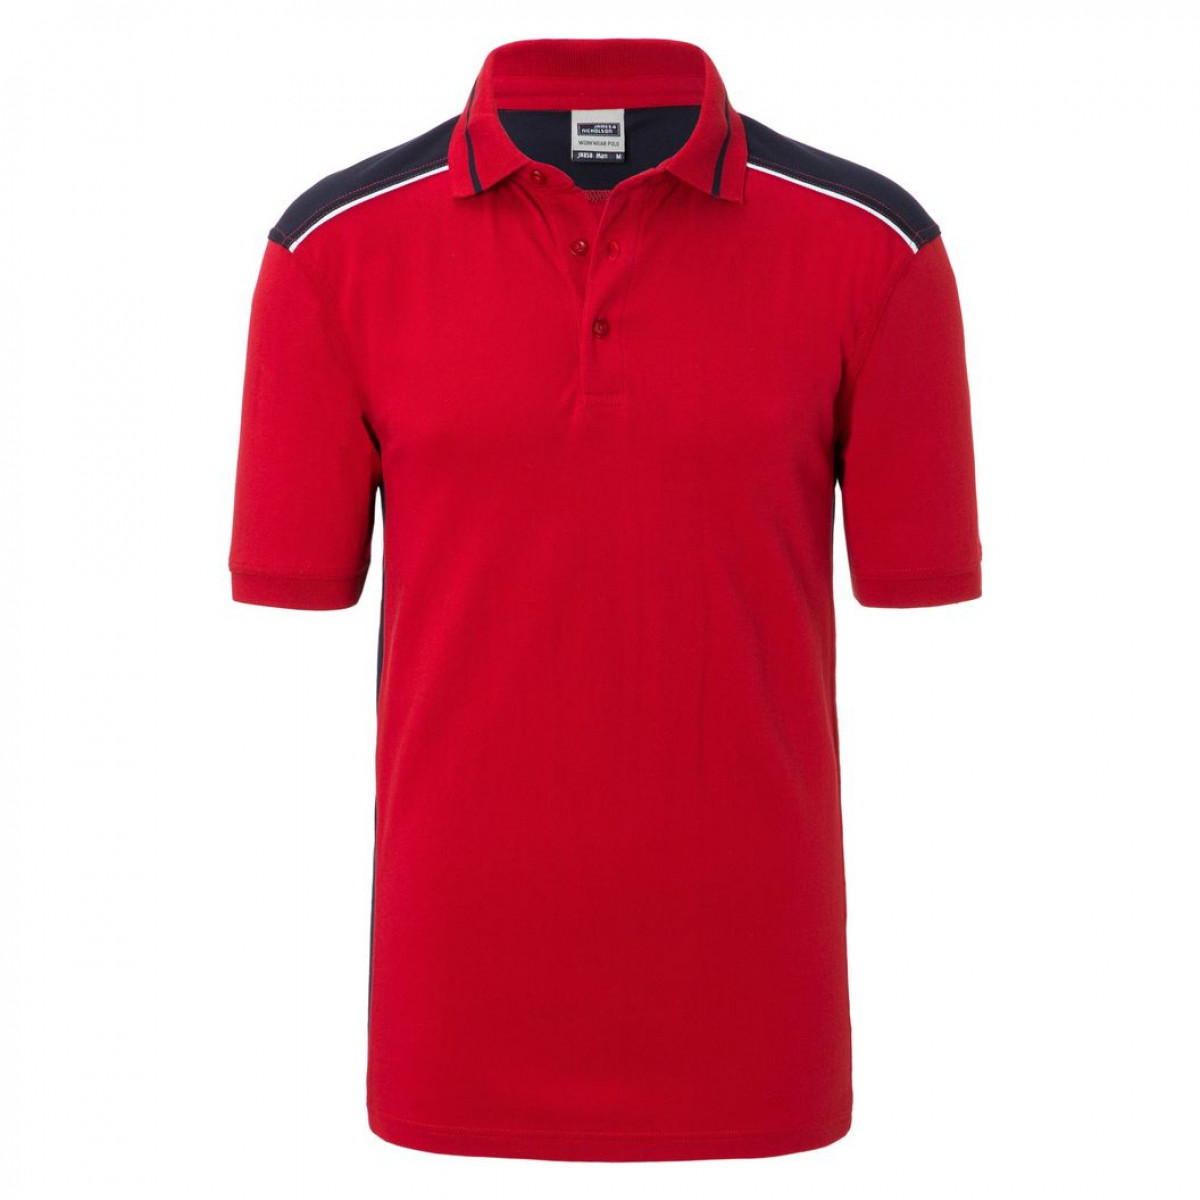 Рубашка поло мужская JN858 Mens Workwear Polo-Level 2 - Красный/Темно-синий